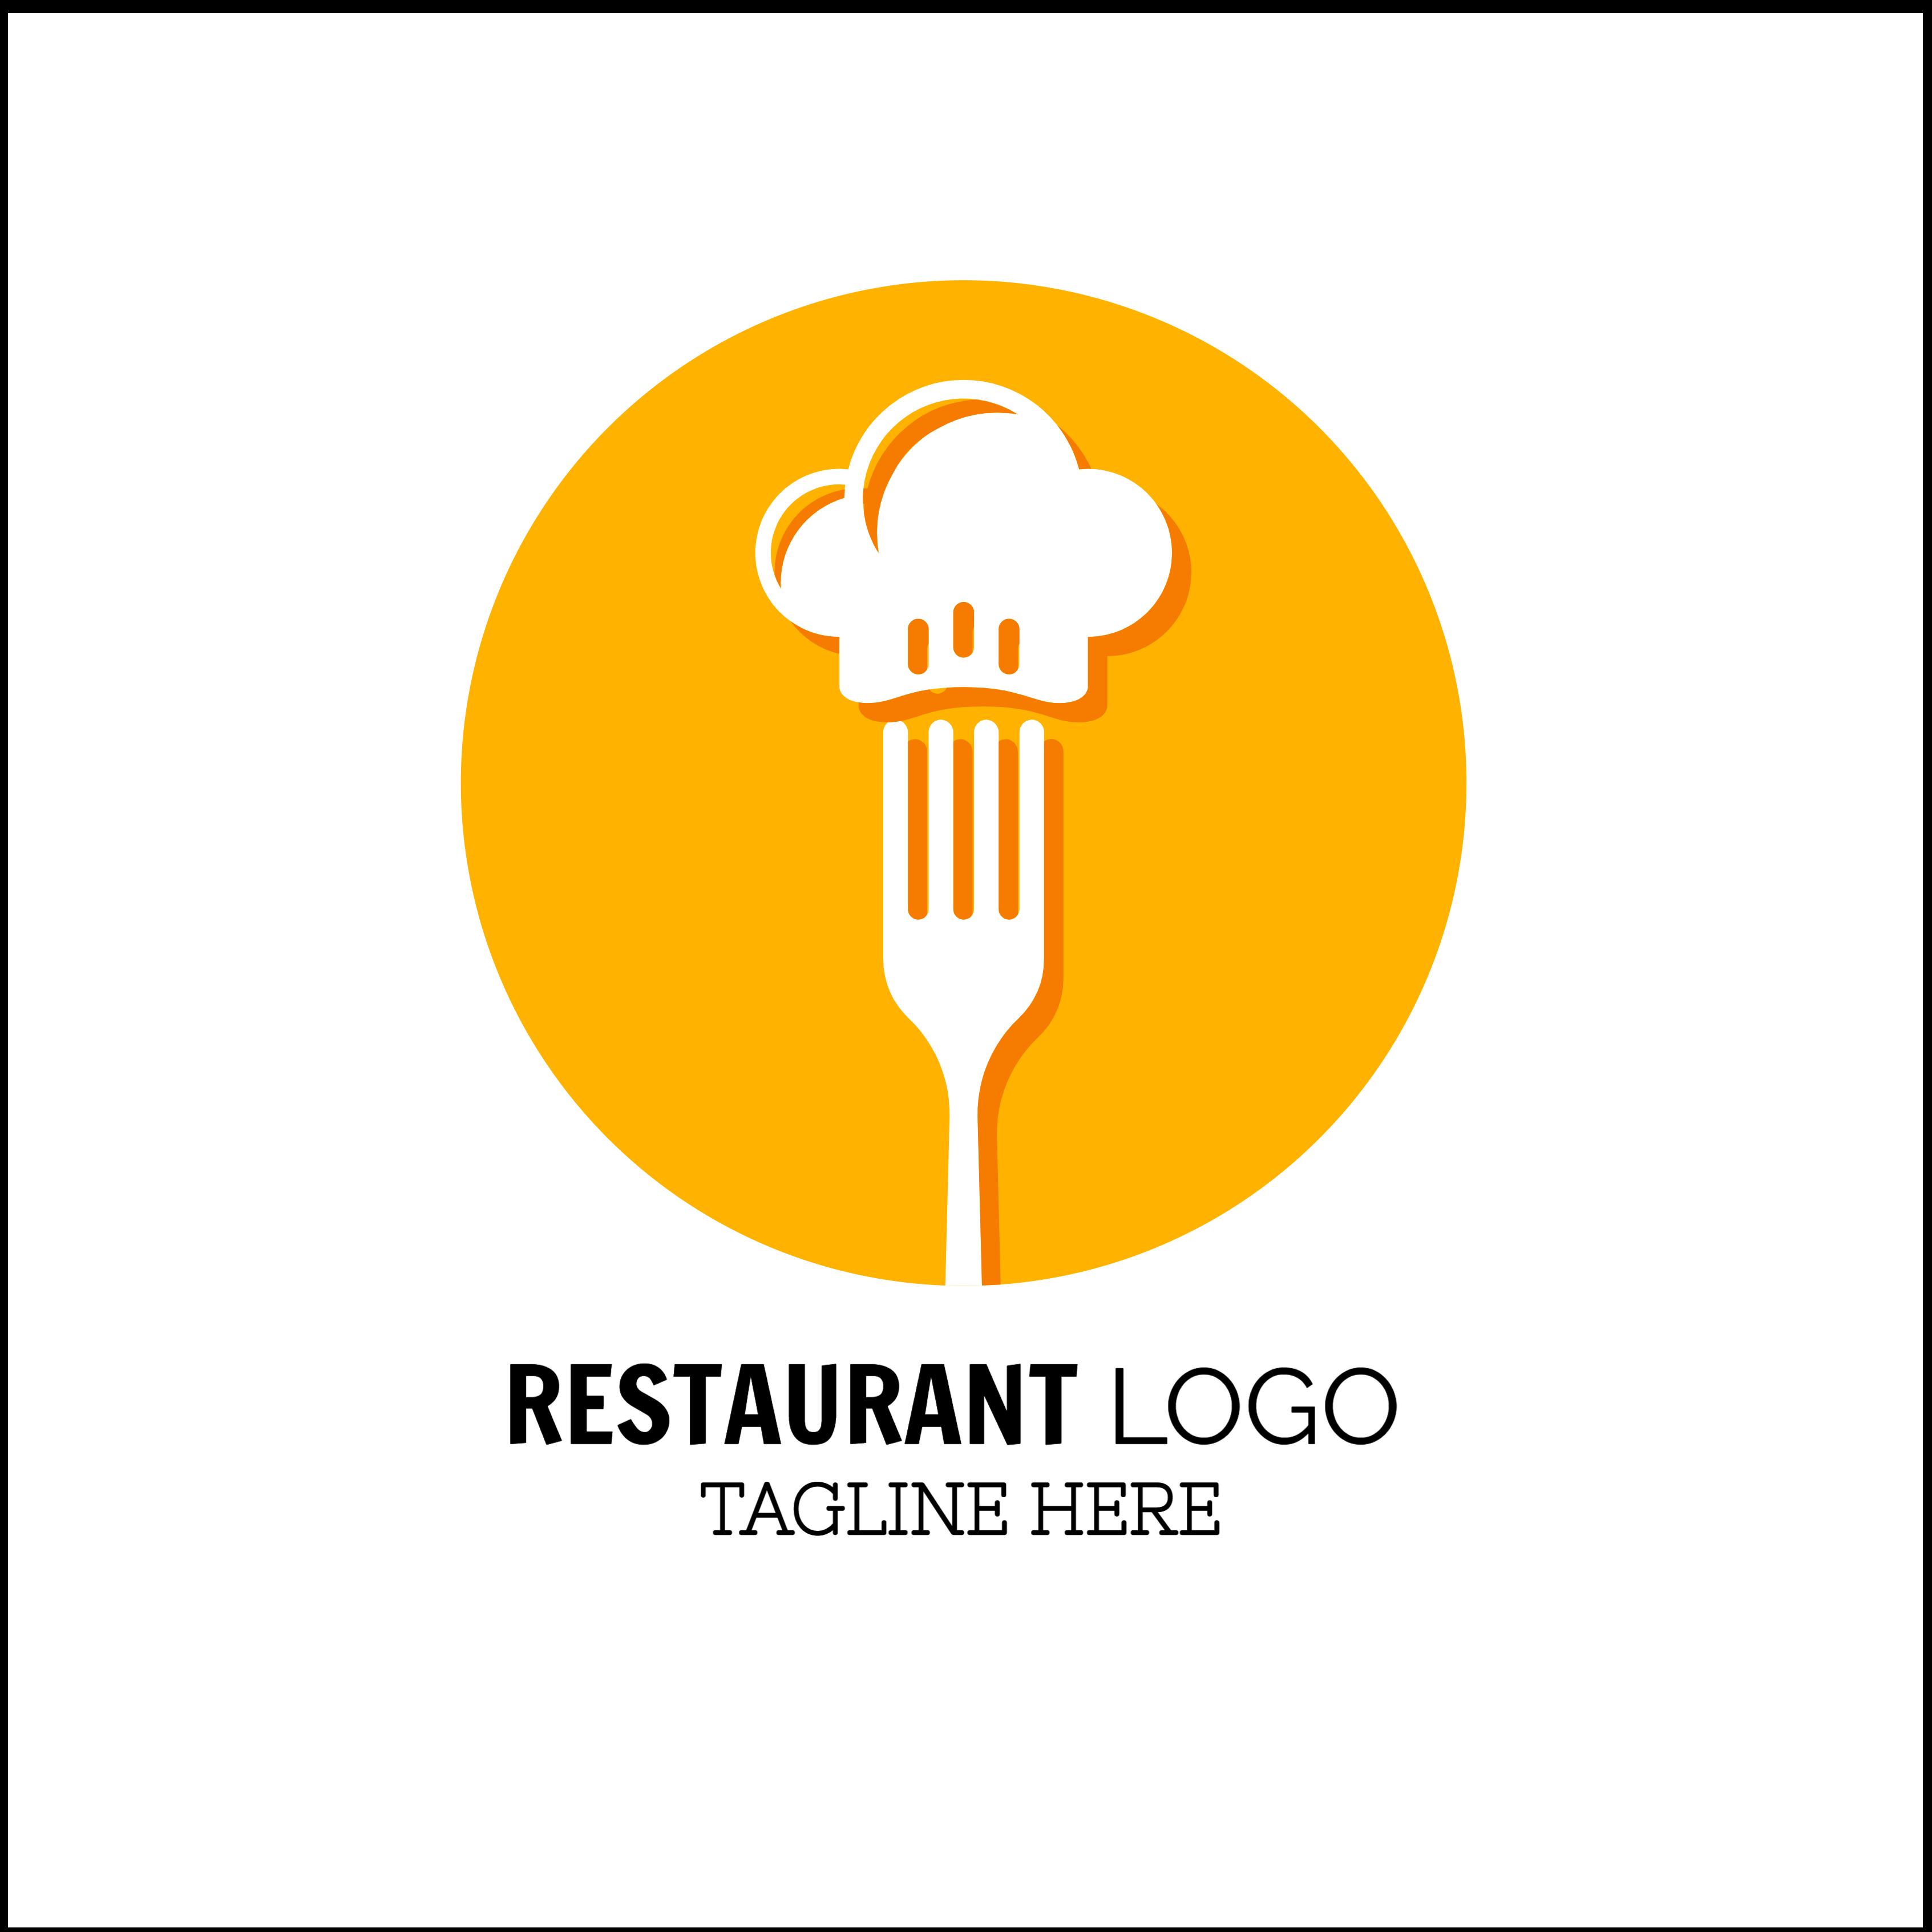 Https I Pinimg Com Originals 48 78 6d 48786db88c95237f6e0b375dc991448a Png Logo Restaurant Logo Templates Best Logo Design